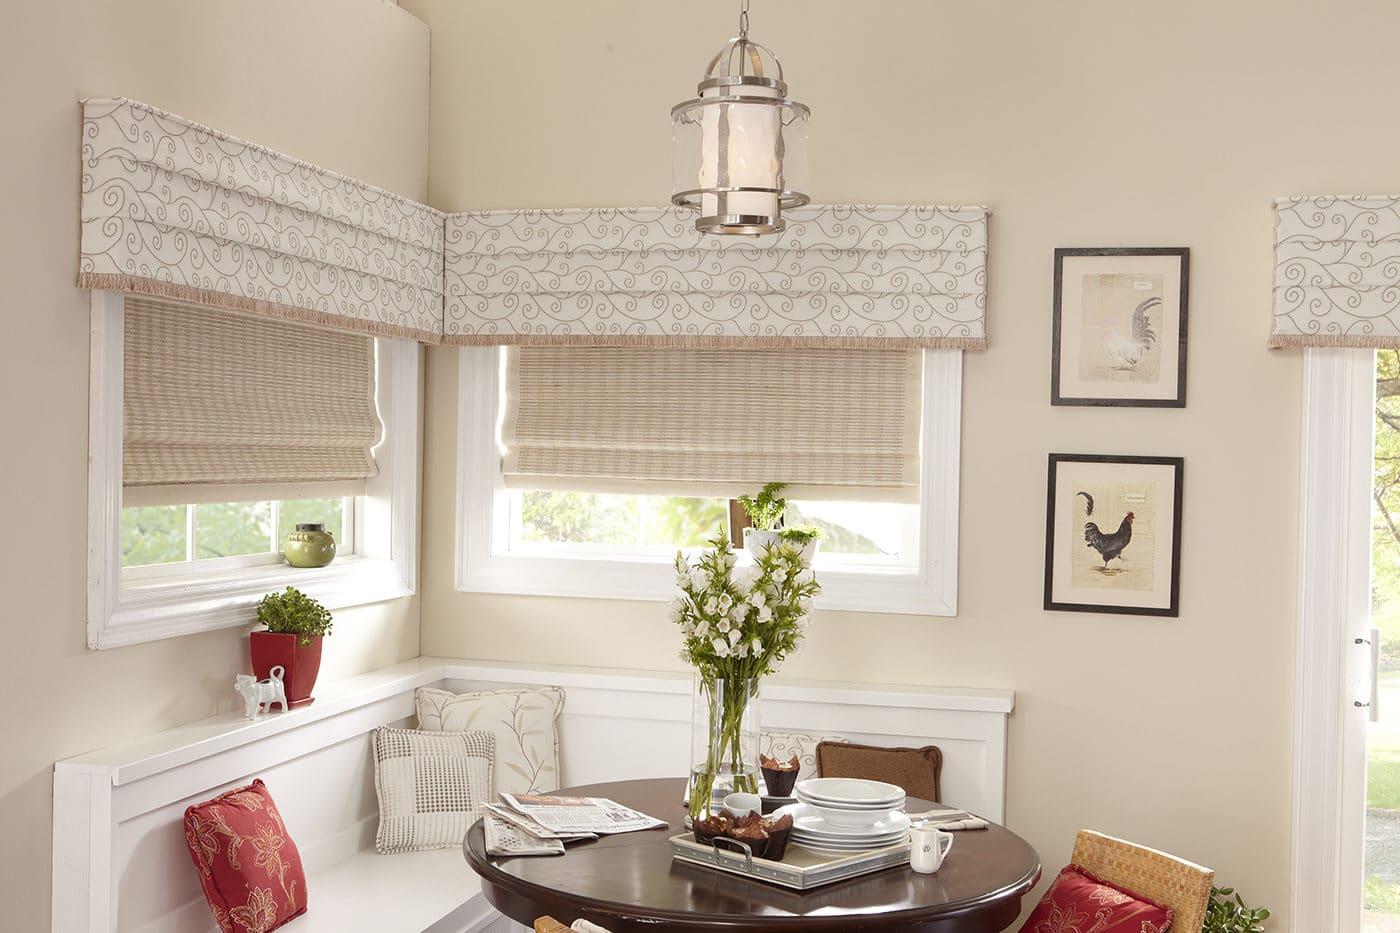 Cornice-Hobbled-Shade-Fabric-Window-Treatments-Curtains-Drapes-Draperies-Blinds-Horizon-Breakfast-Nook-1400x933